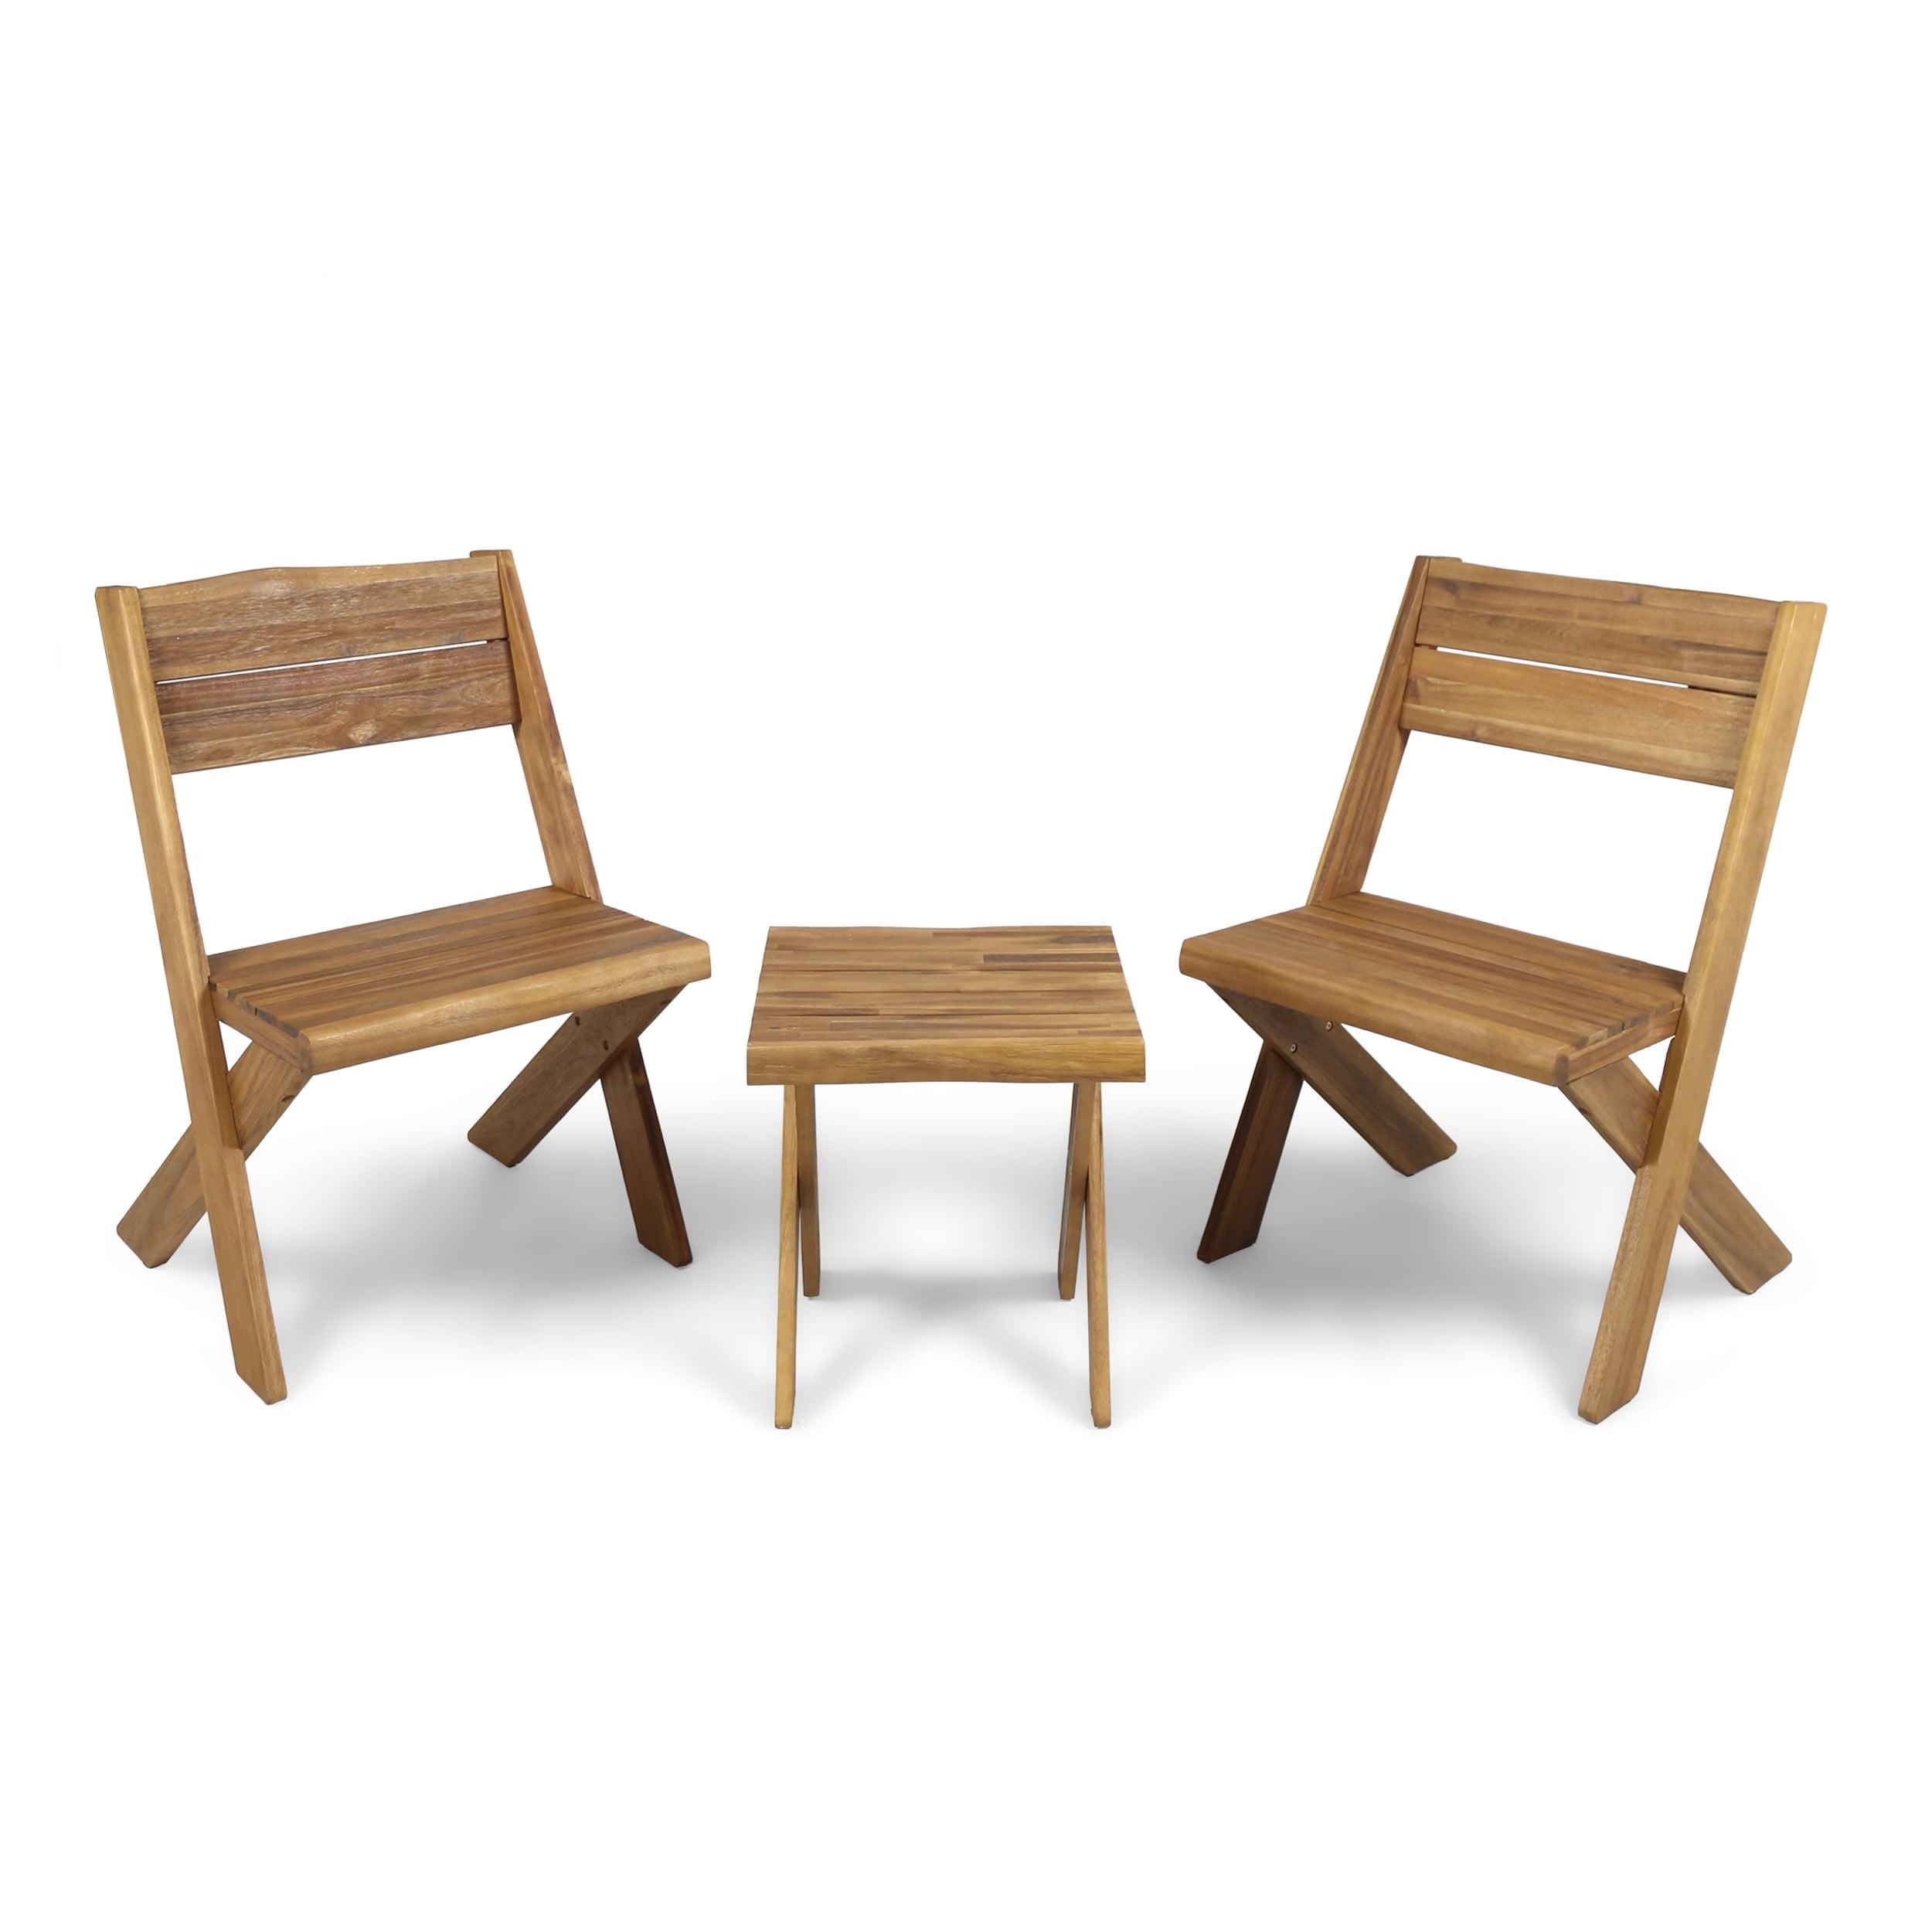 Outdoor Acacia Wood 2 Seater Chat Set, Teak